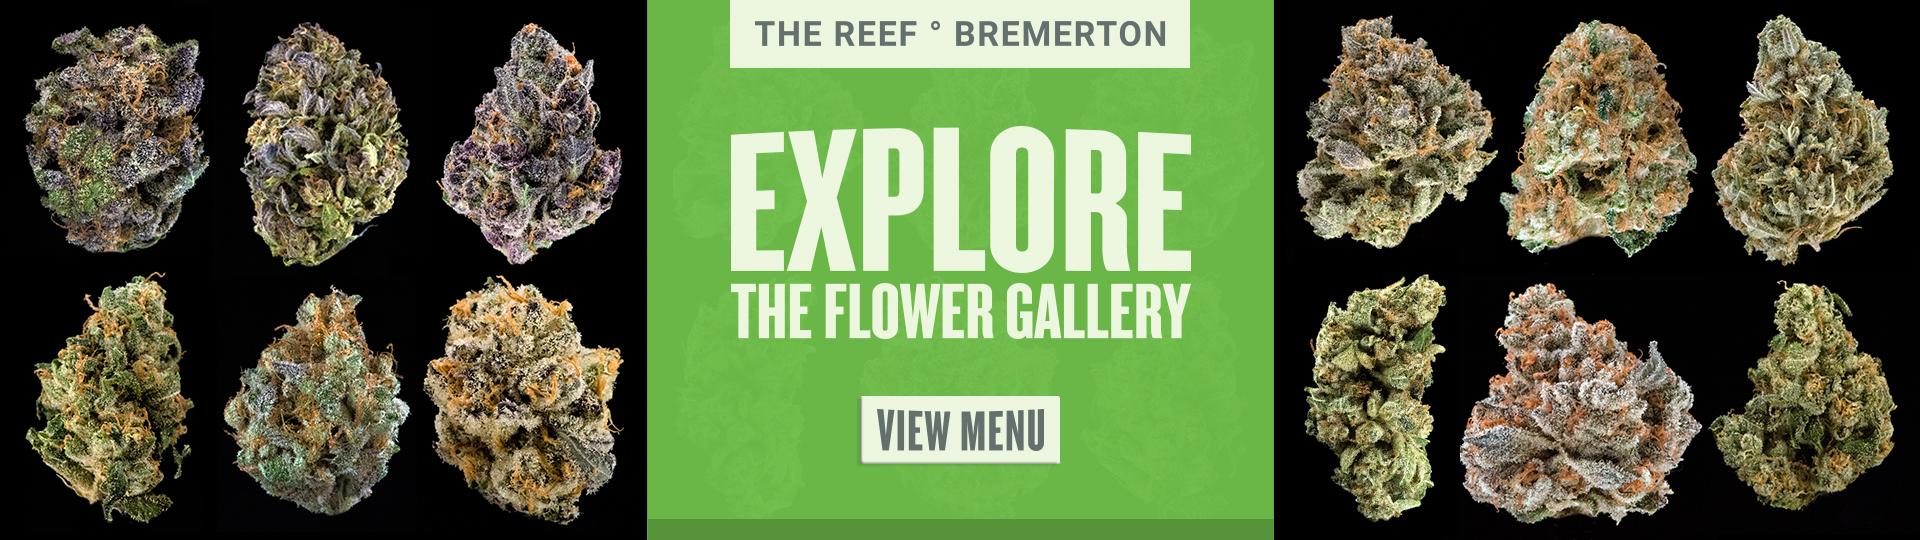 Bremerton gallery